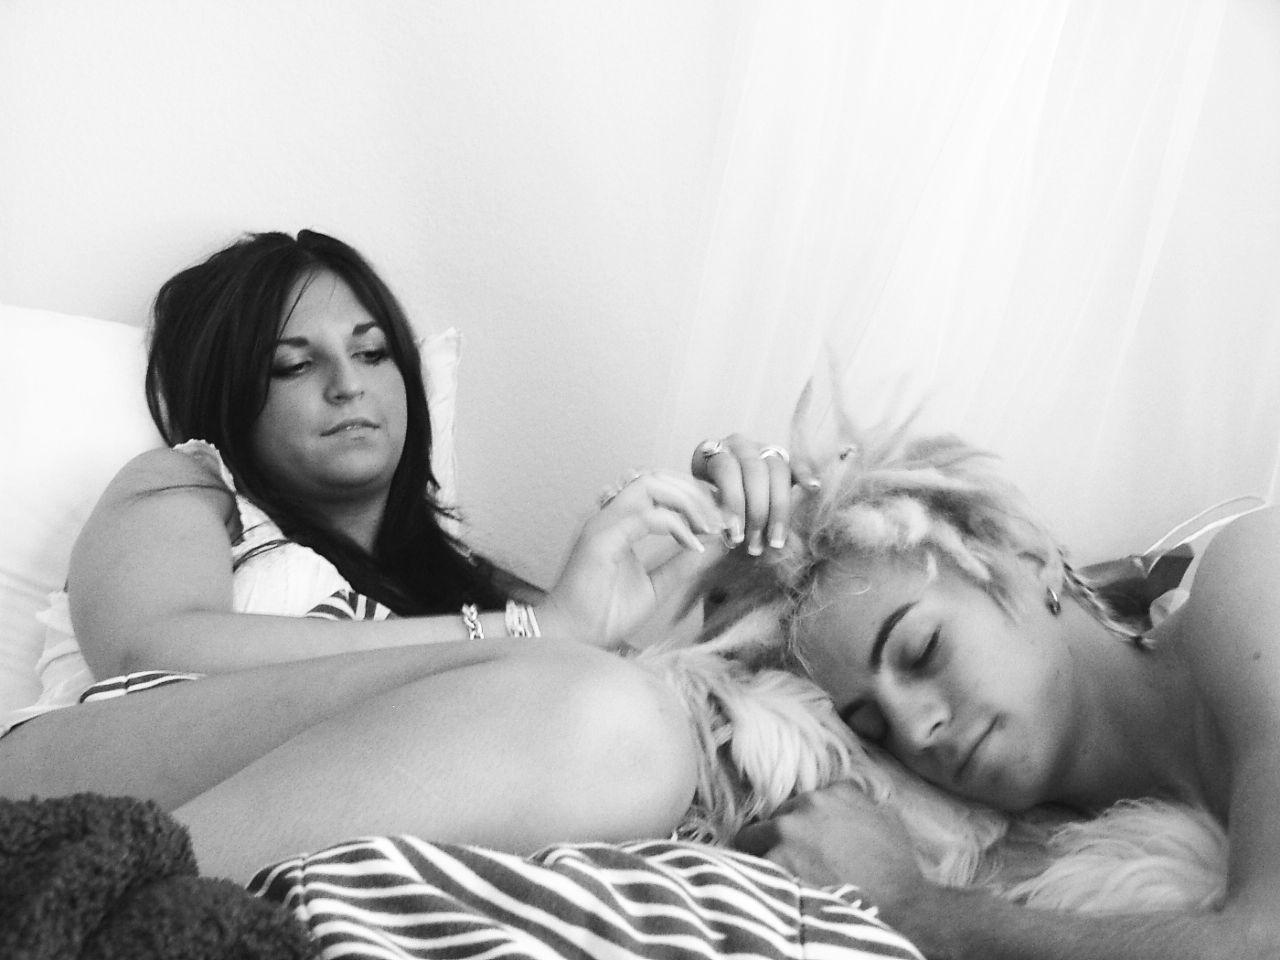 India summer lesbian massage